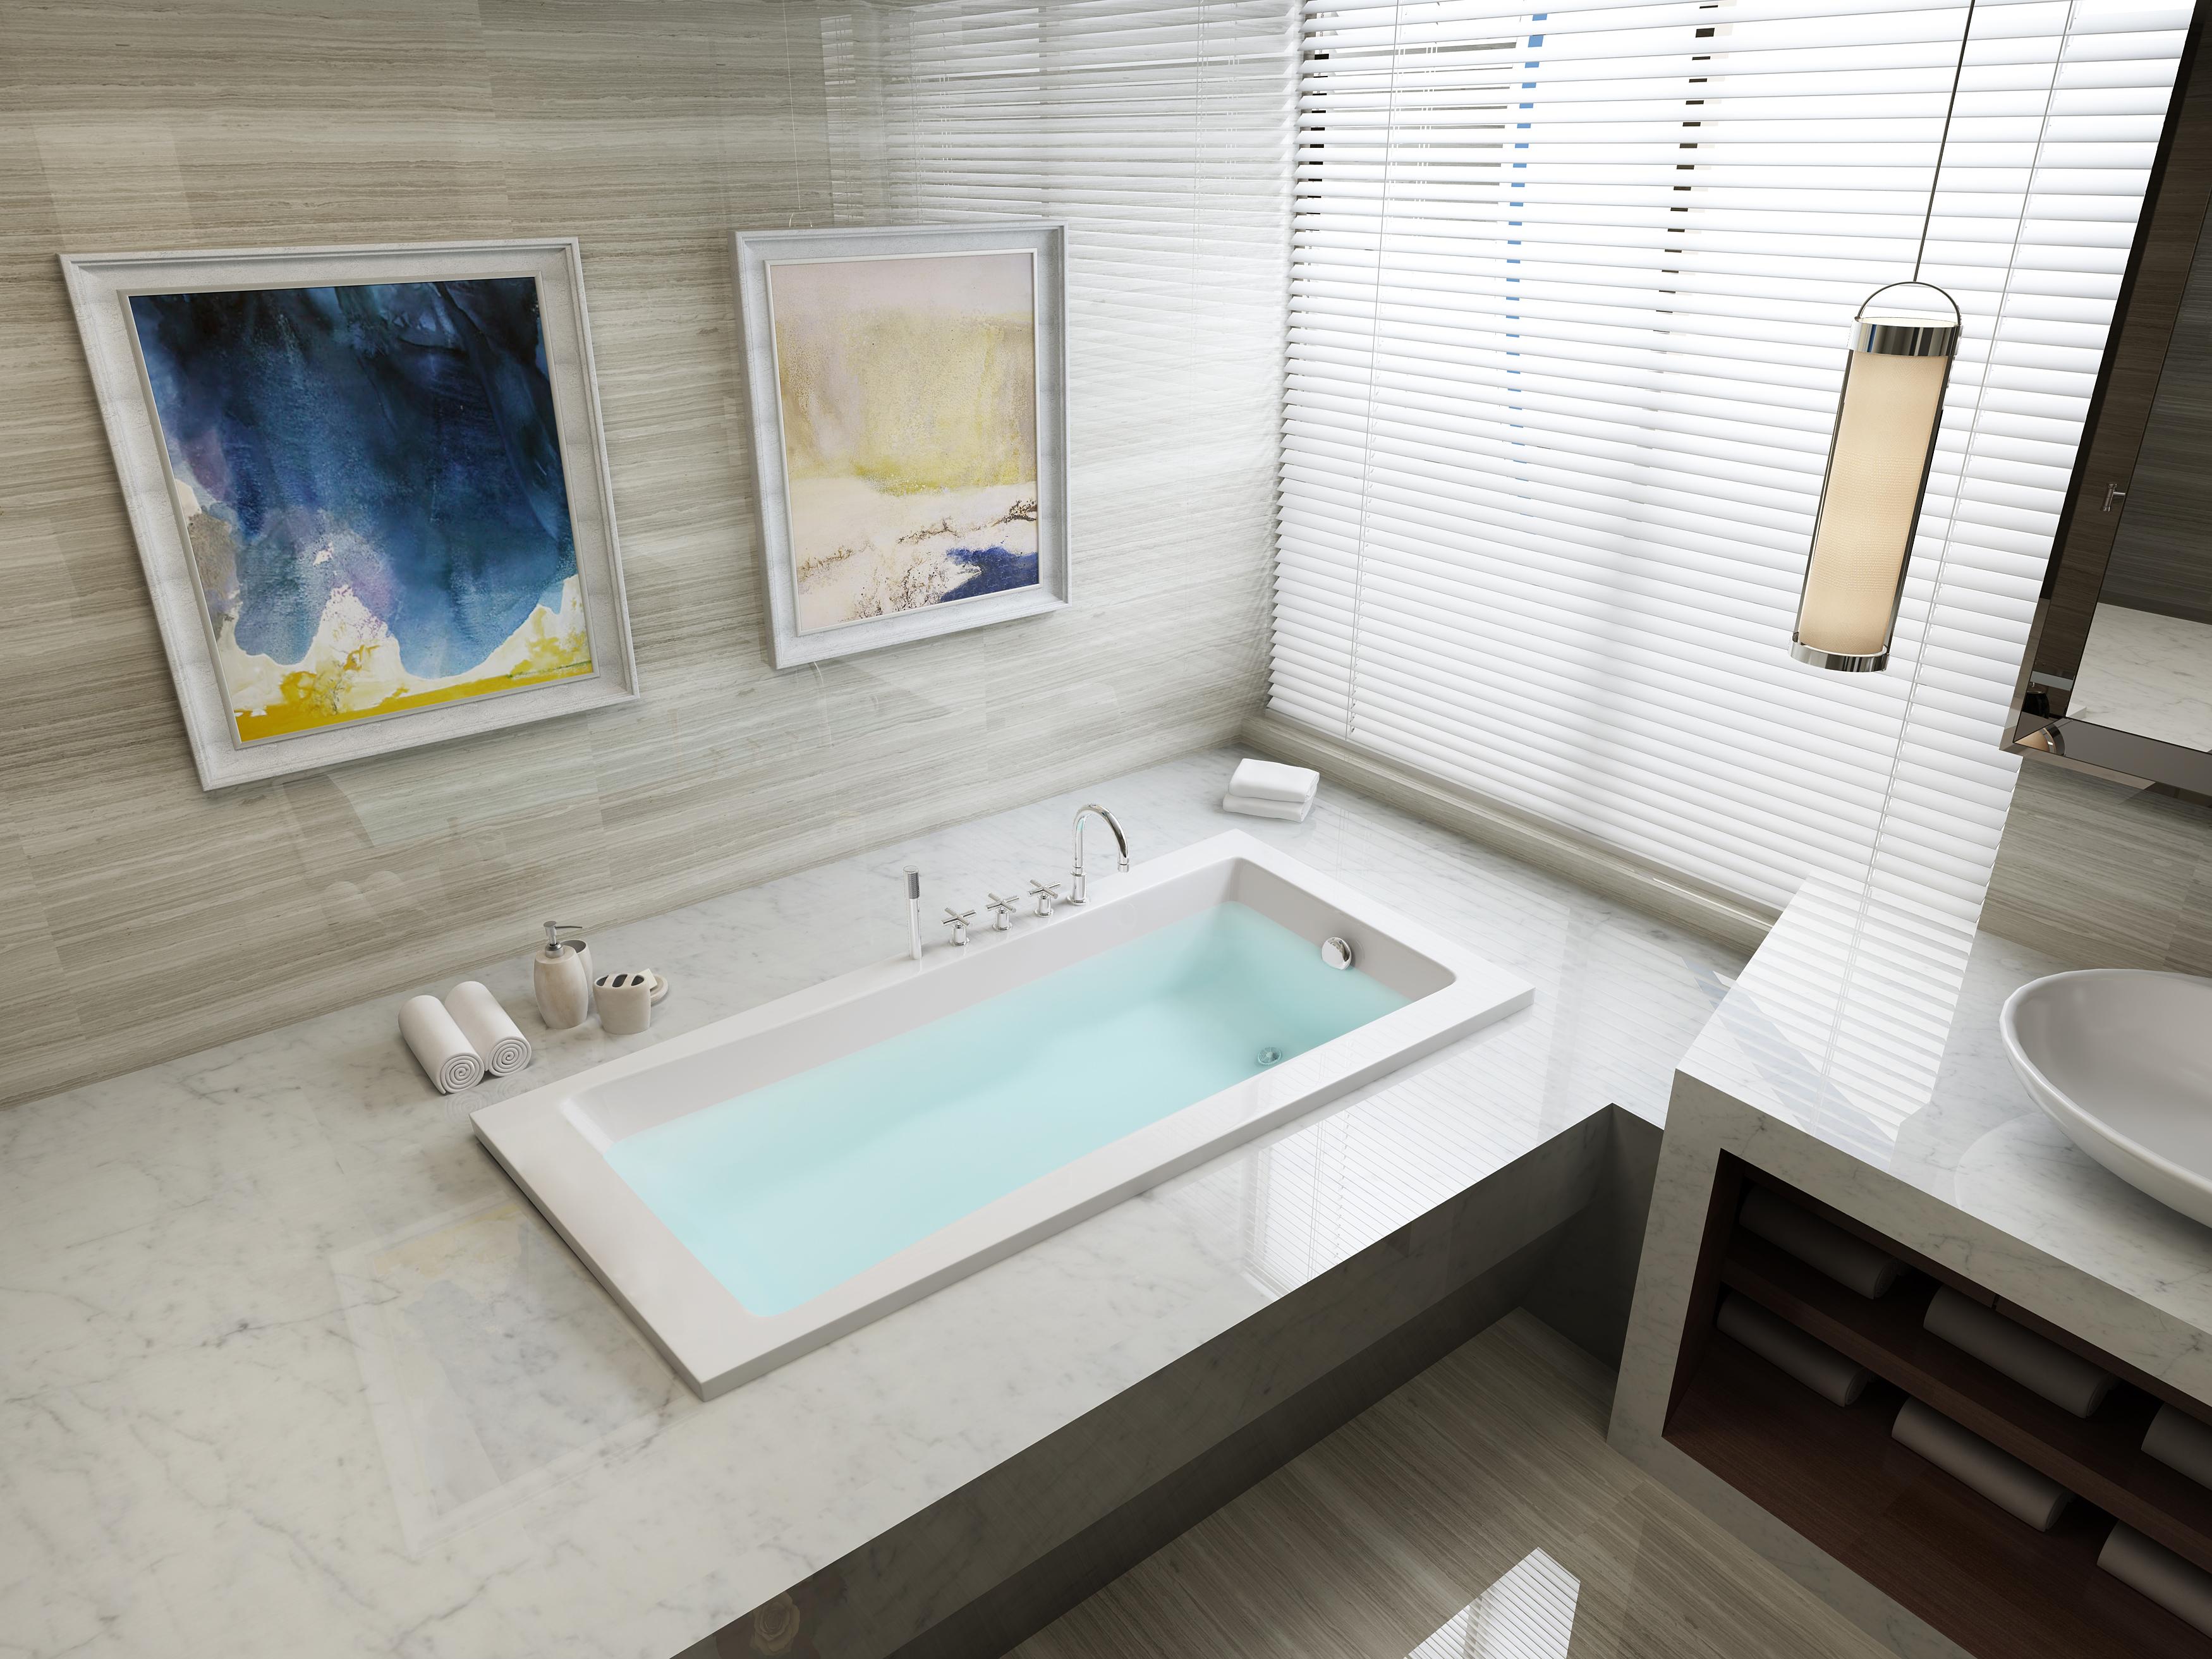 Modern Bathroom Designs Yield Big Returns In Comfort And: 5 Ways To Create A Relaxing Bathroom